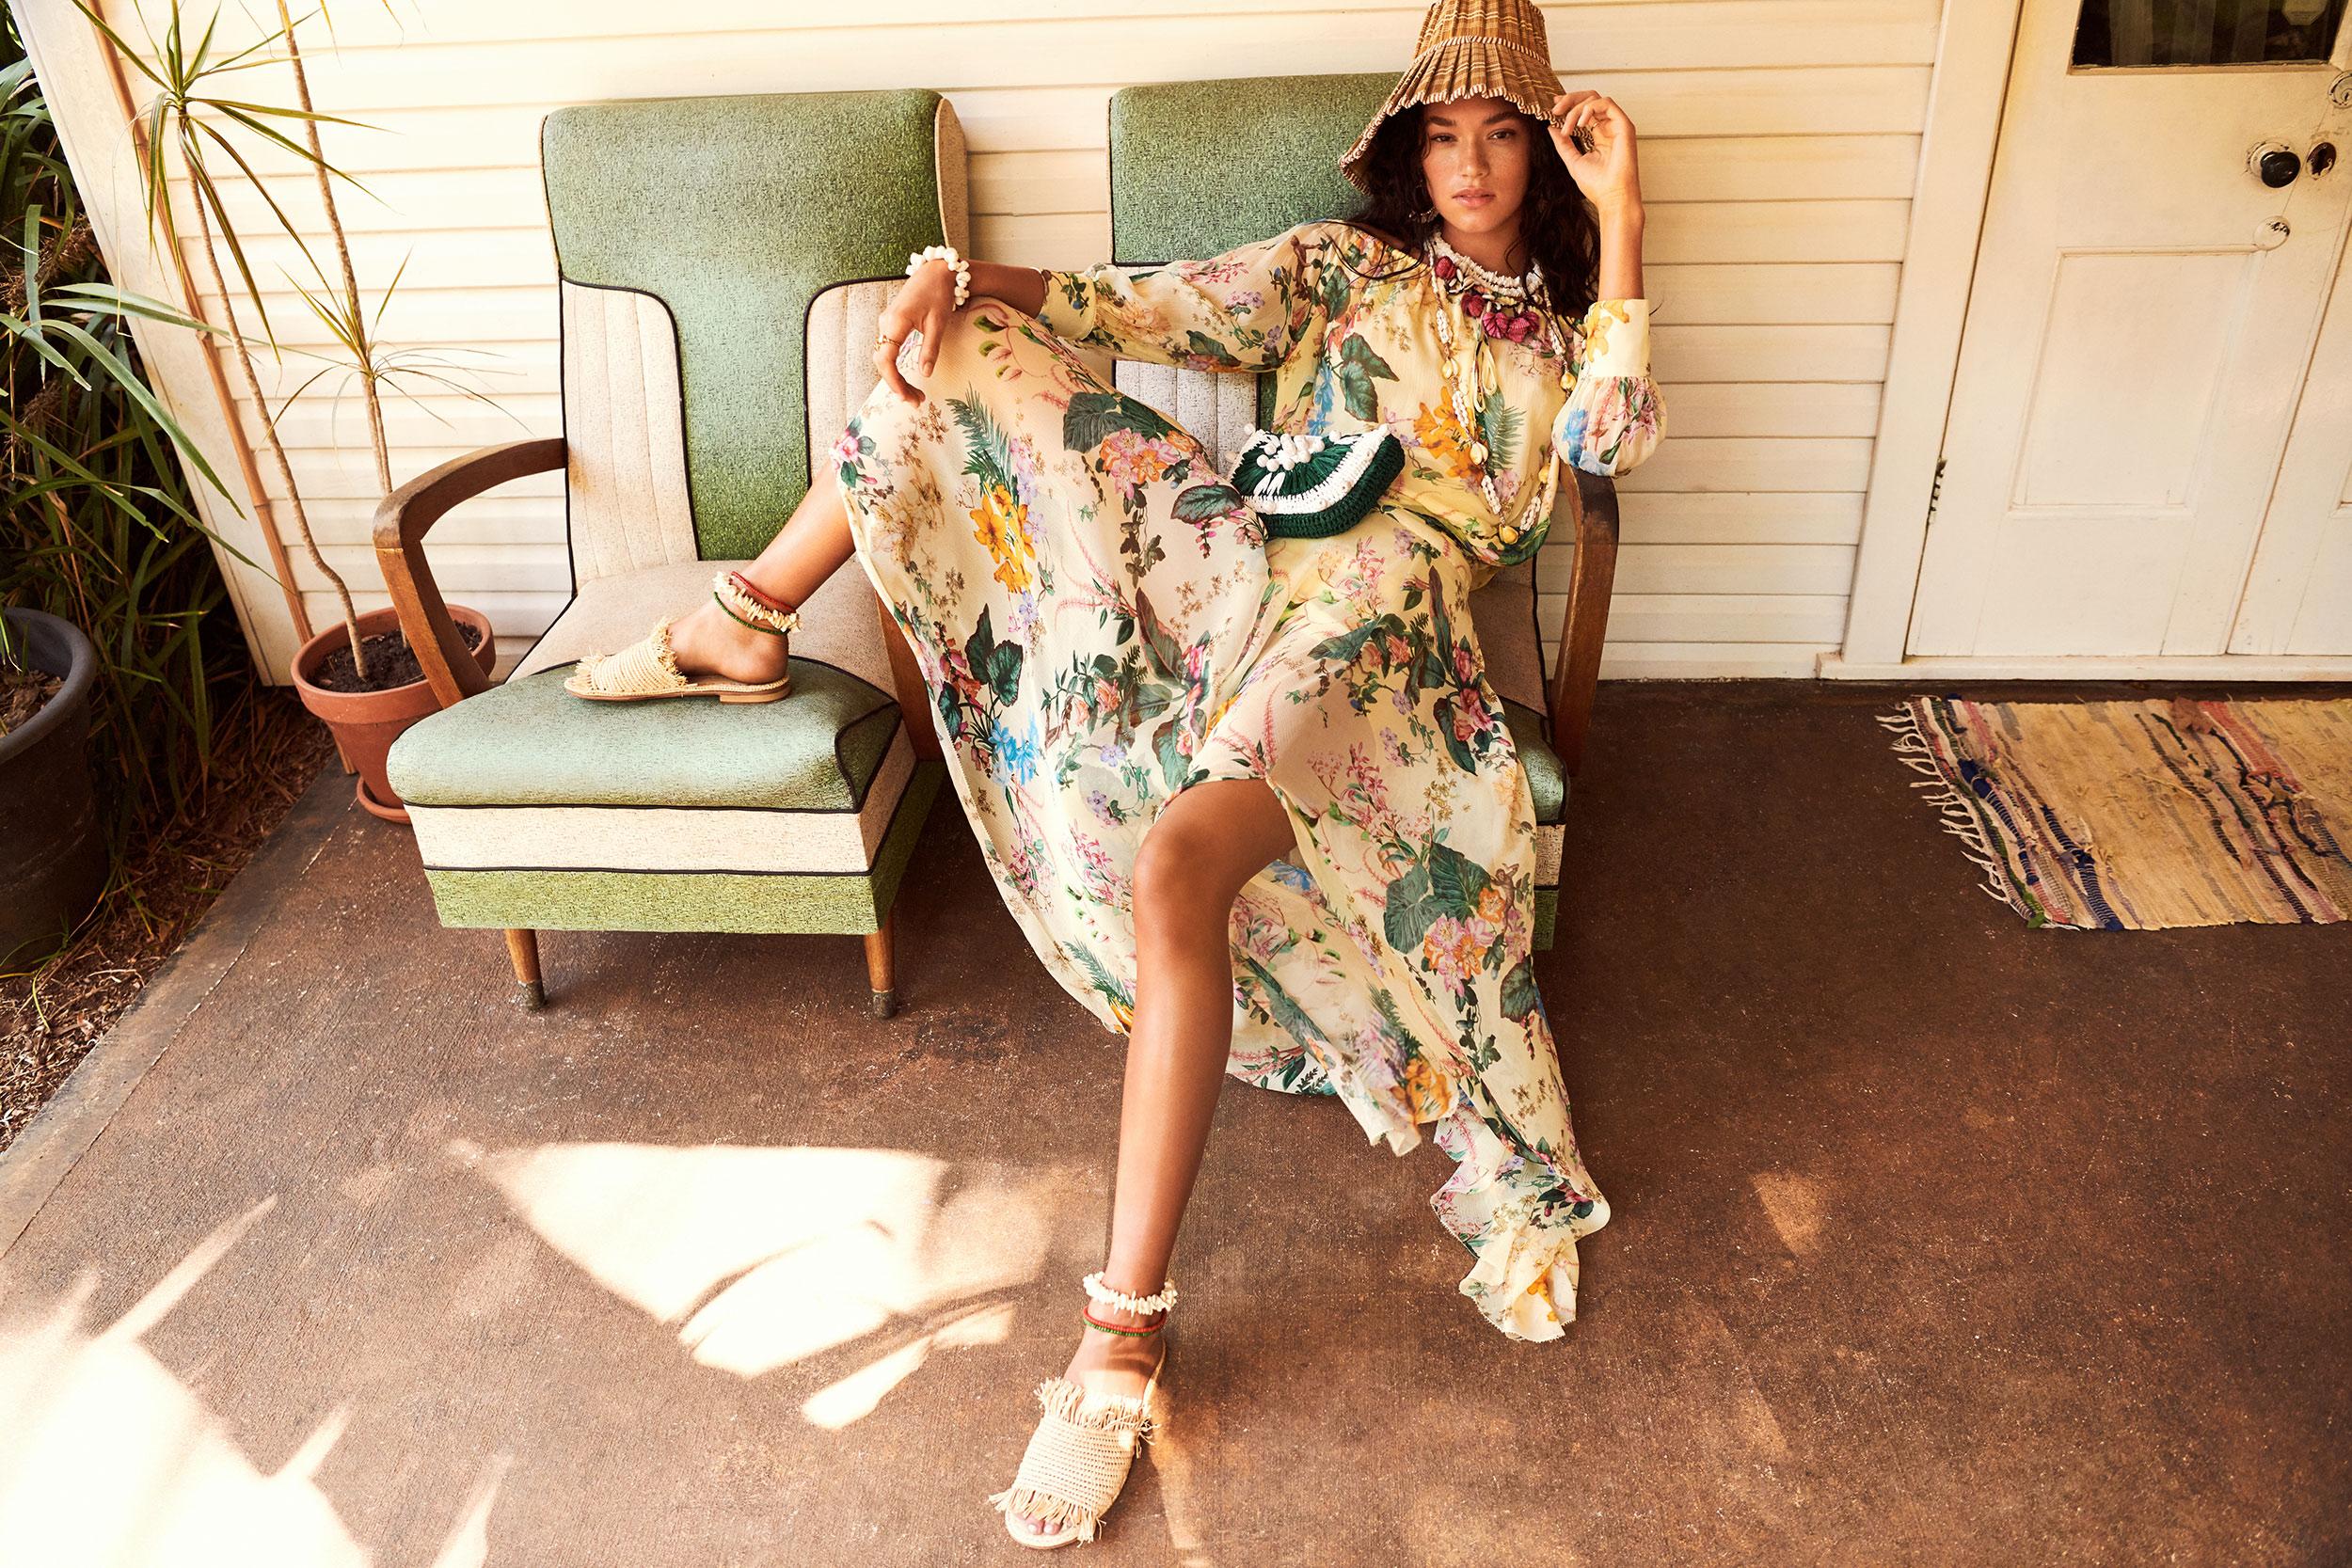 Iconic Aussie Fashion Brand Tigerlily Unveils Brand Relaunch Via